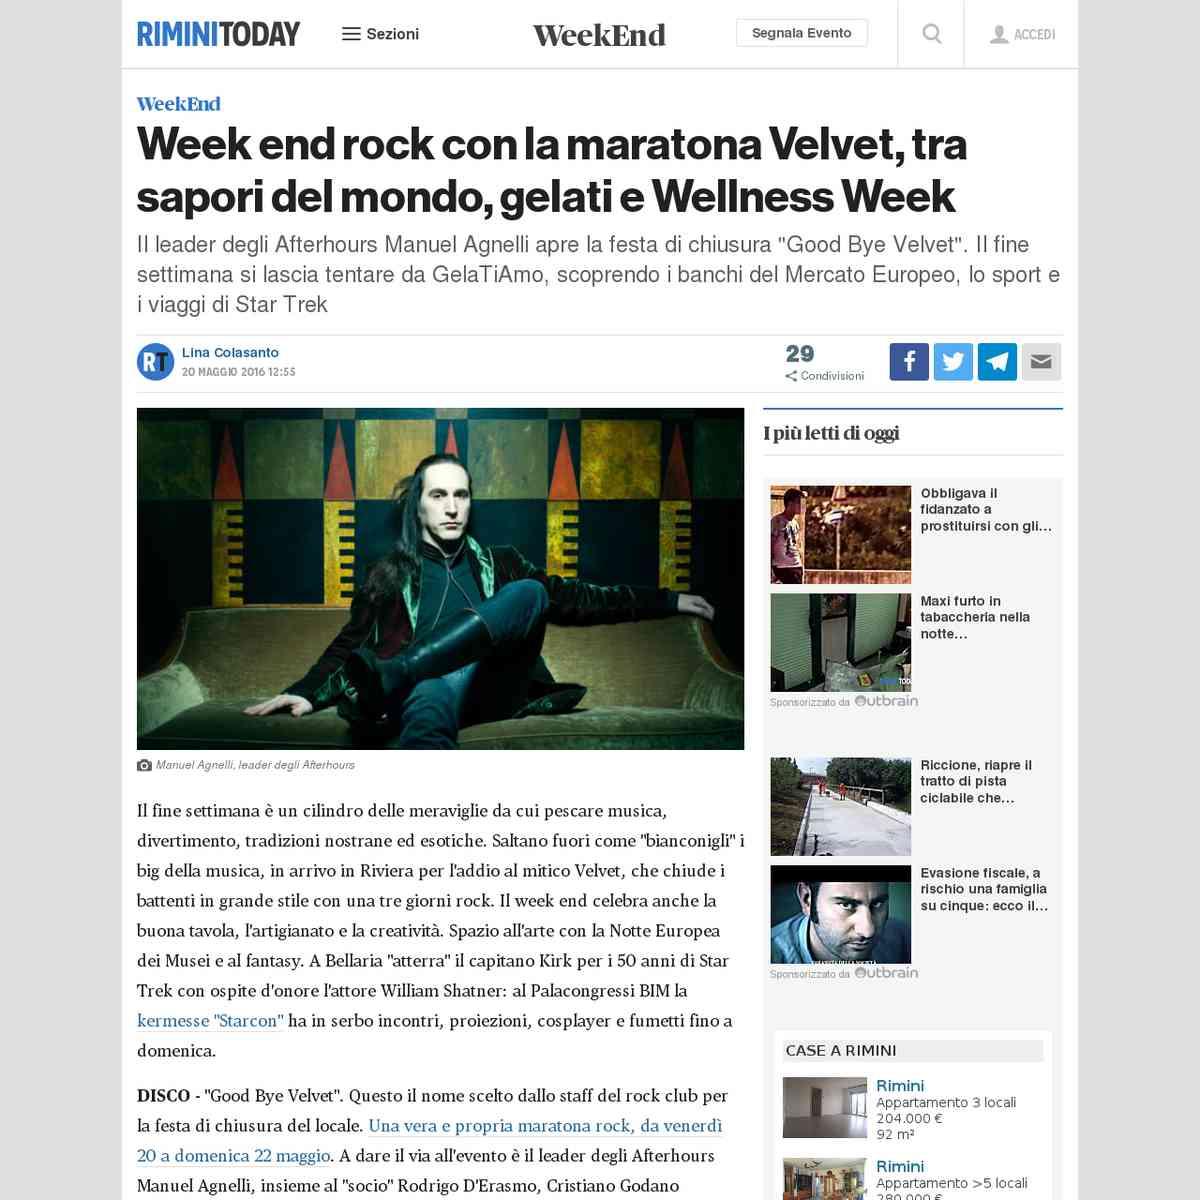 Week end rock con la maratona Velvet, tra sapori del mondo, gelati e Wellness Week - Rimini Today -…